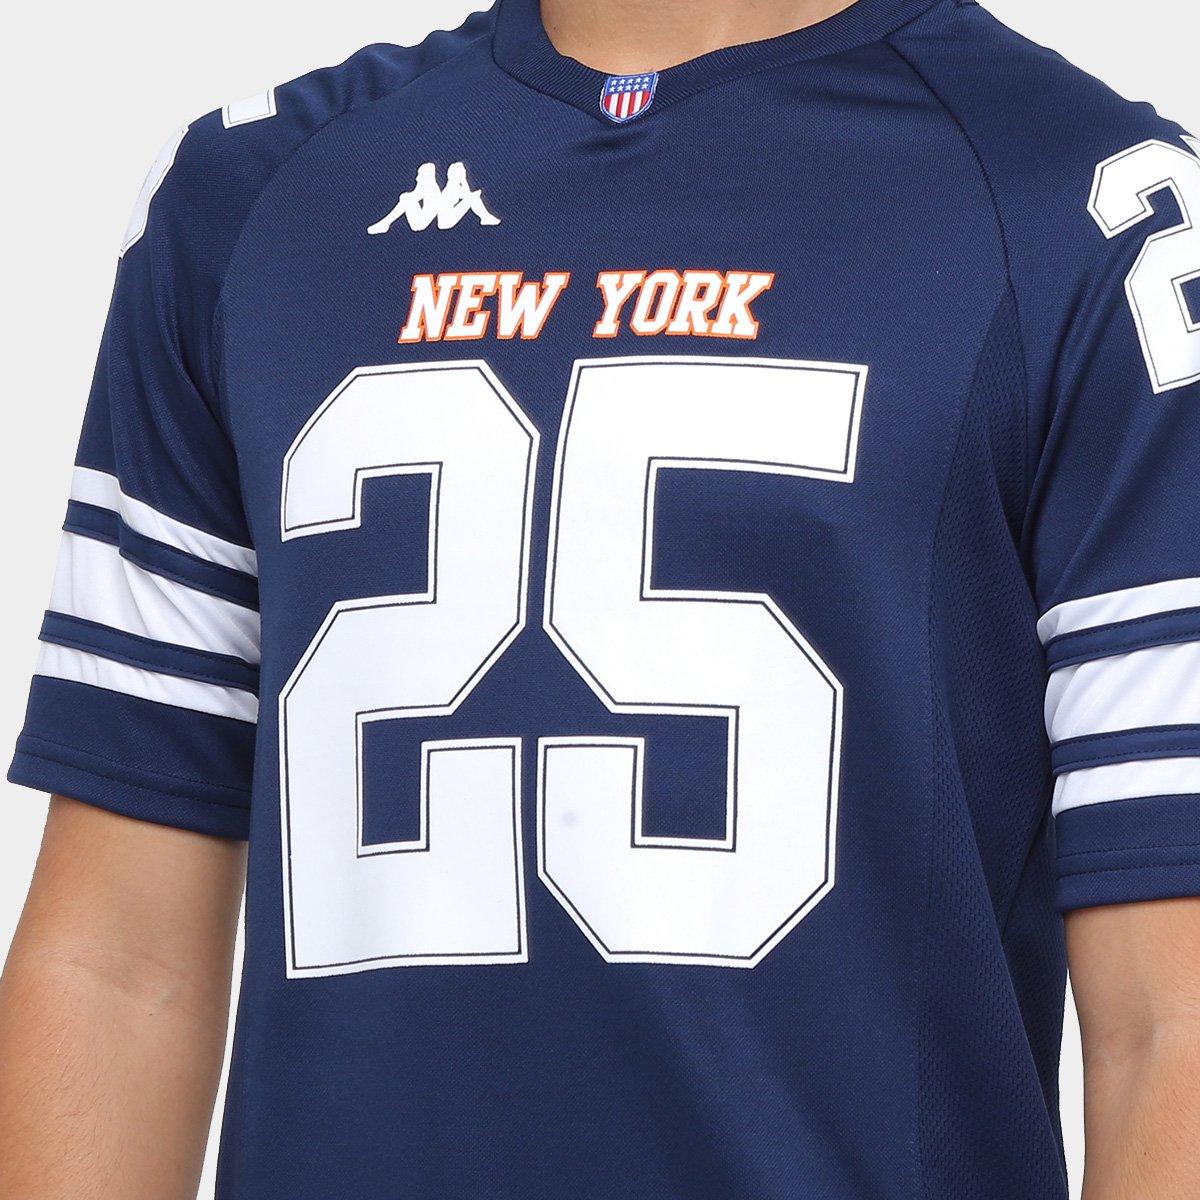 1e4409c421 Camiseta New York Kappa Futebol Americano Masculina - Azul Royal